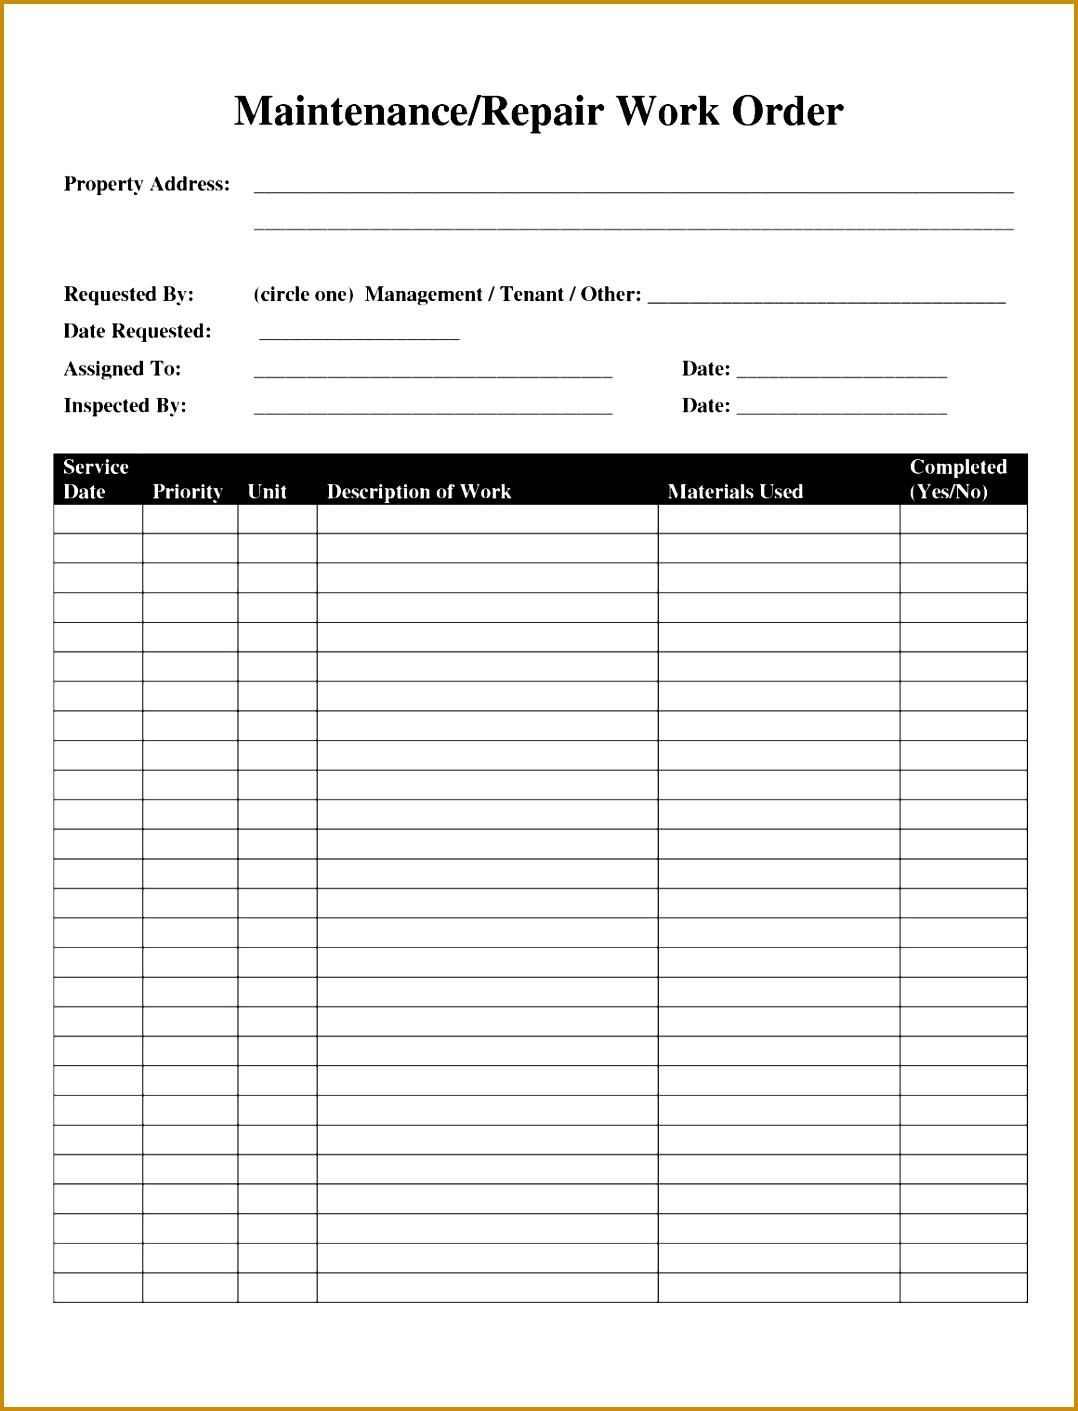 Building Maintenance Work order forms 33551 Maintenance form Template Eliolera